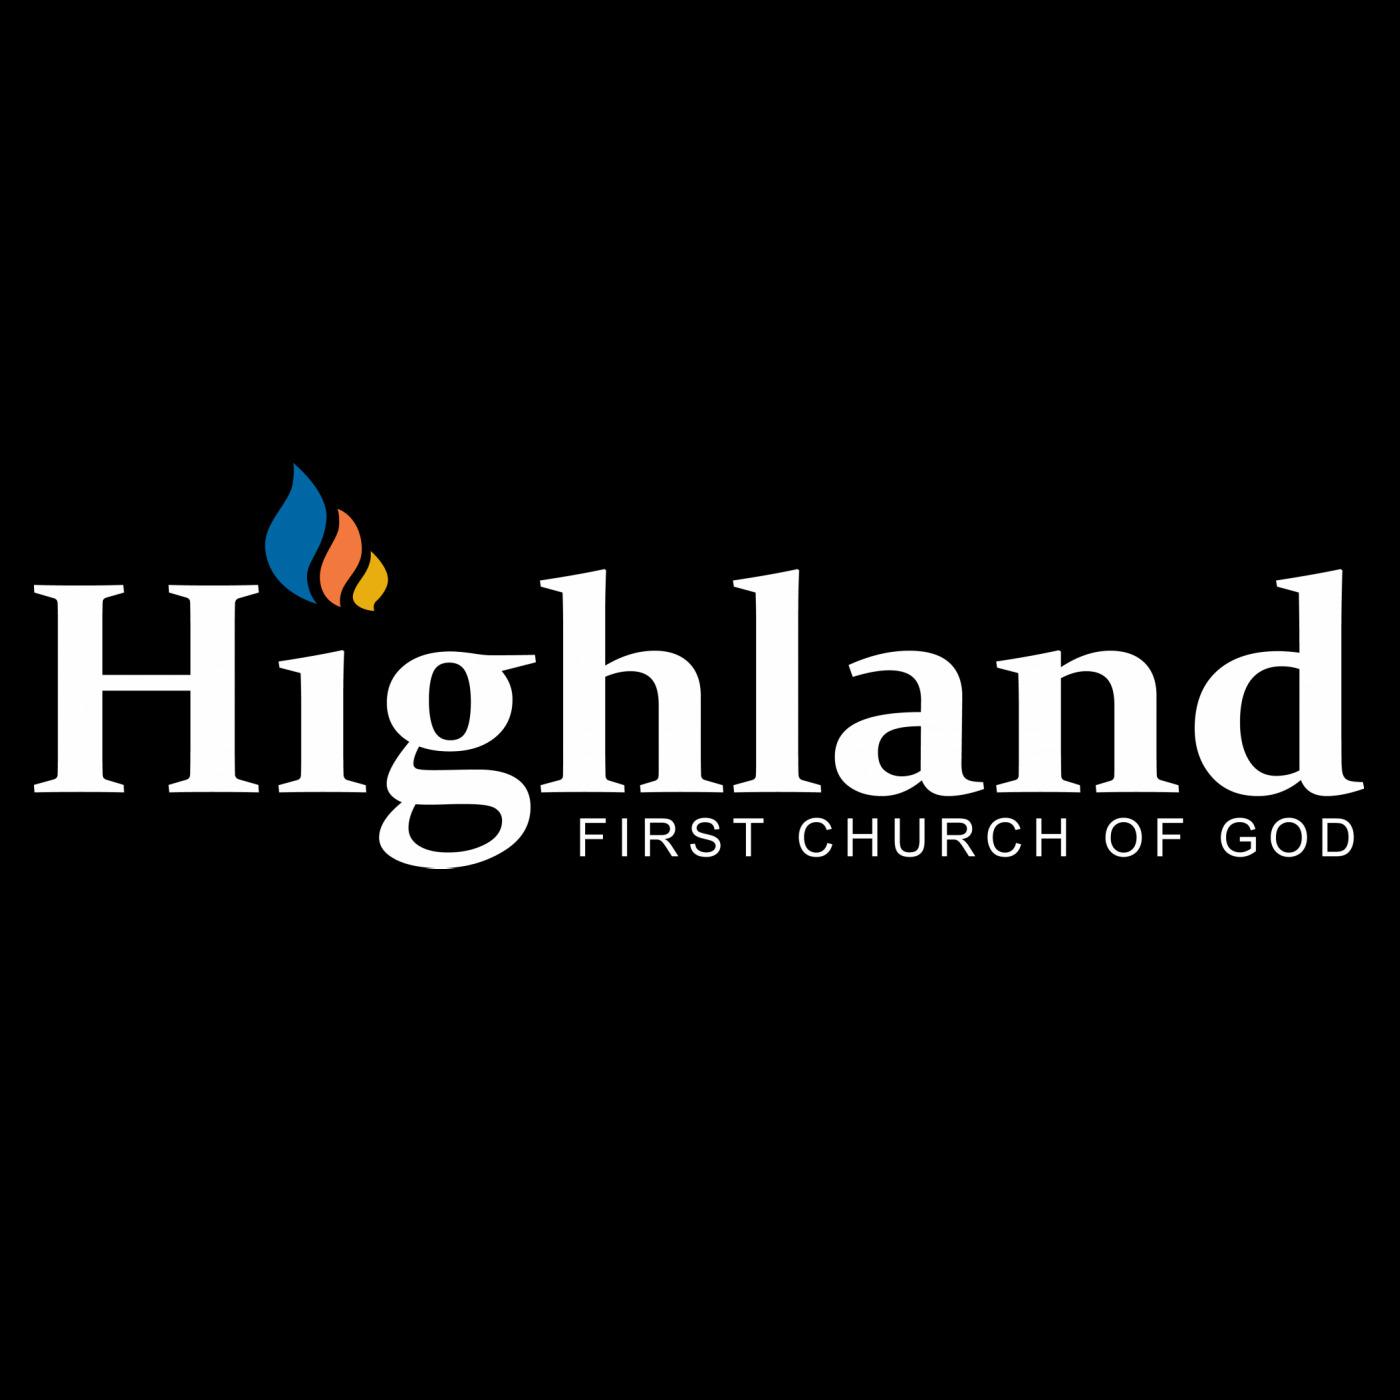 Highland First Church of God